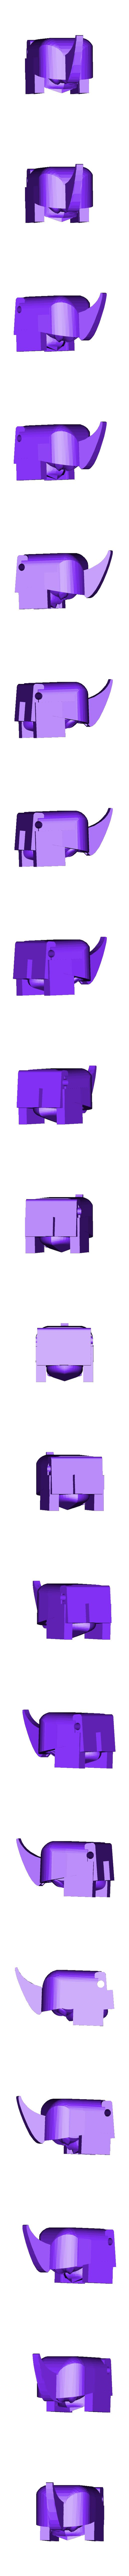 1- G1 ALLICON- HEAD.stl Download STL file Transformers G1 Allicon (11cm Scale) • 3D print object, mmshightail